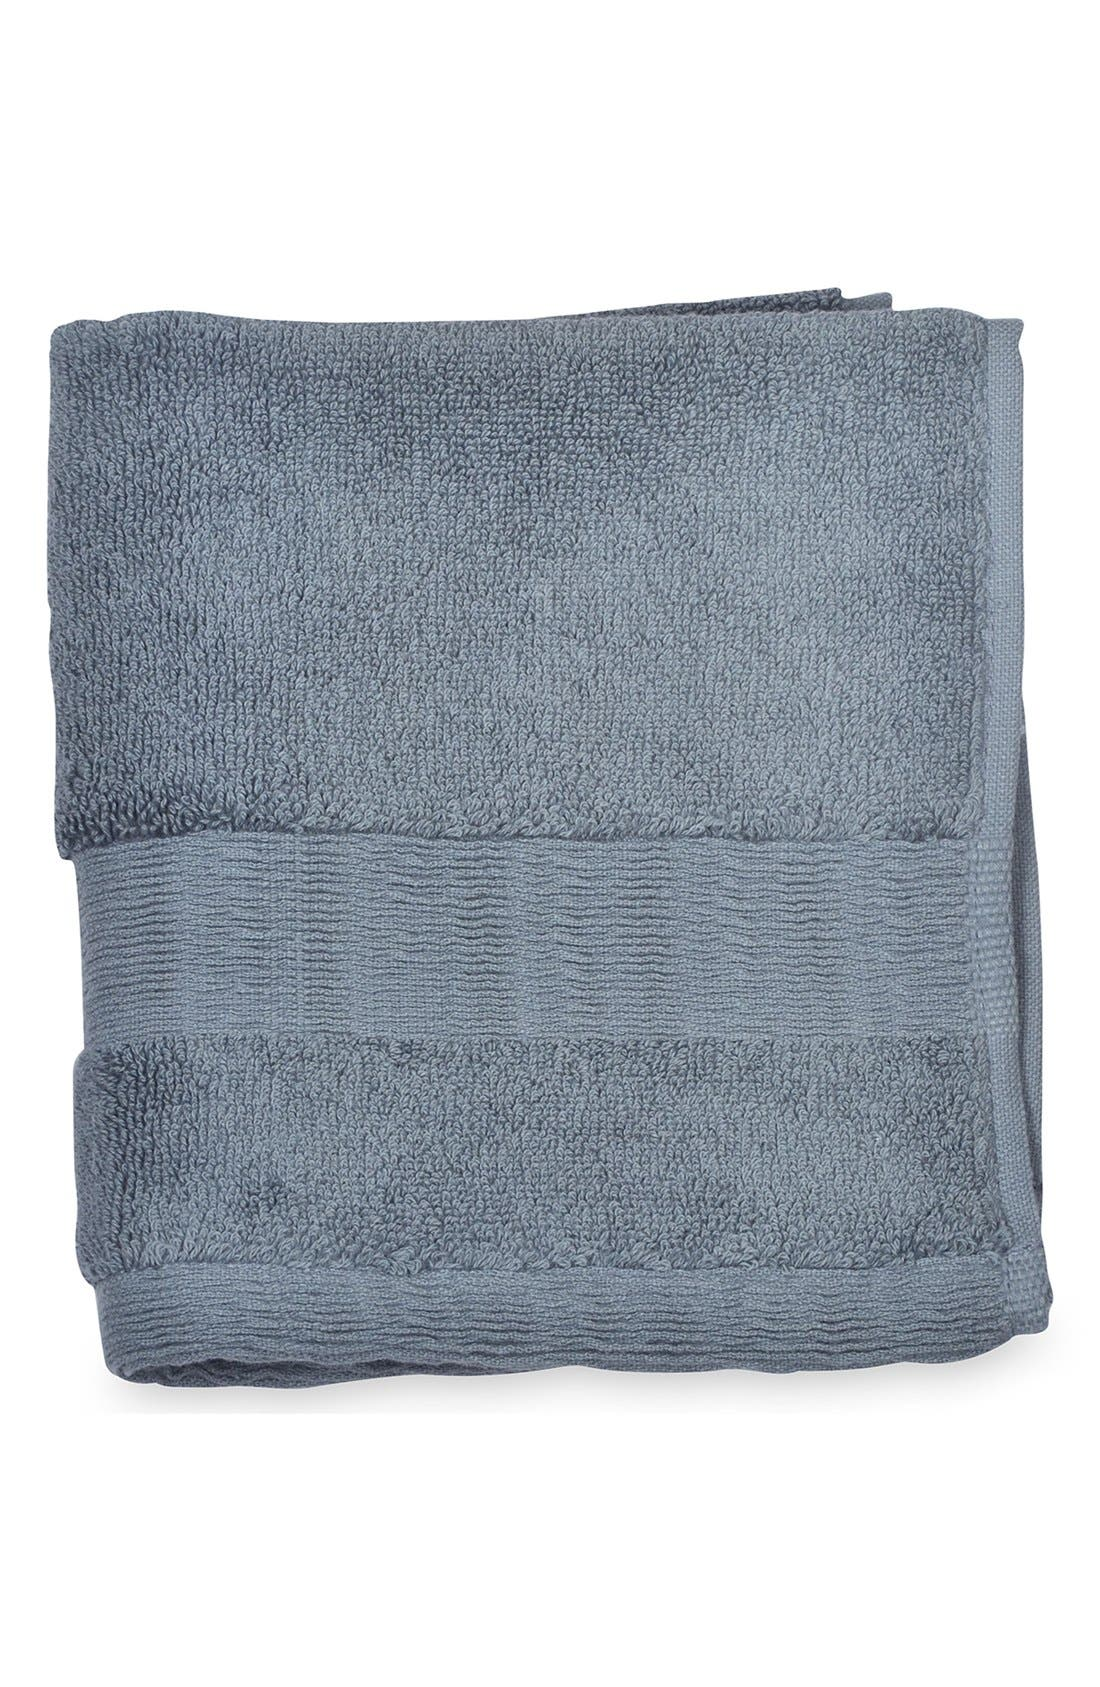 Alternate Image 1 Selected - DKNY Mercer Wash Towel